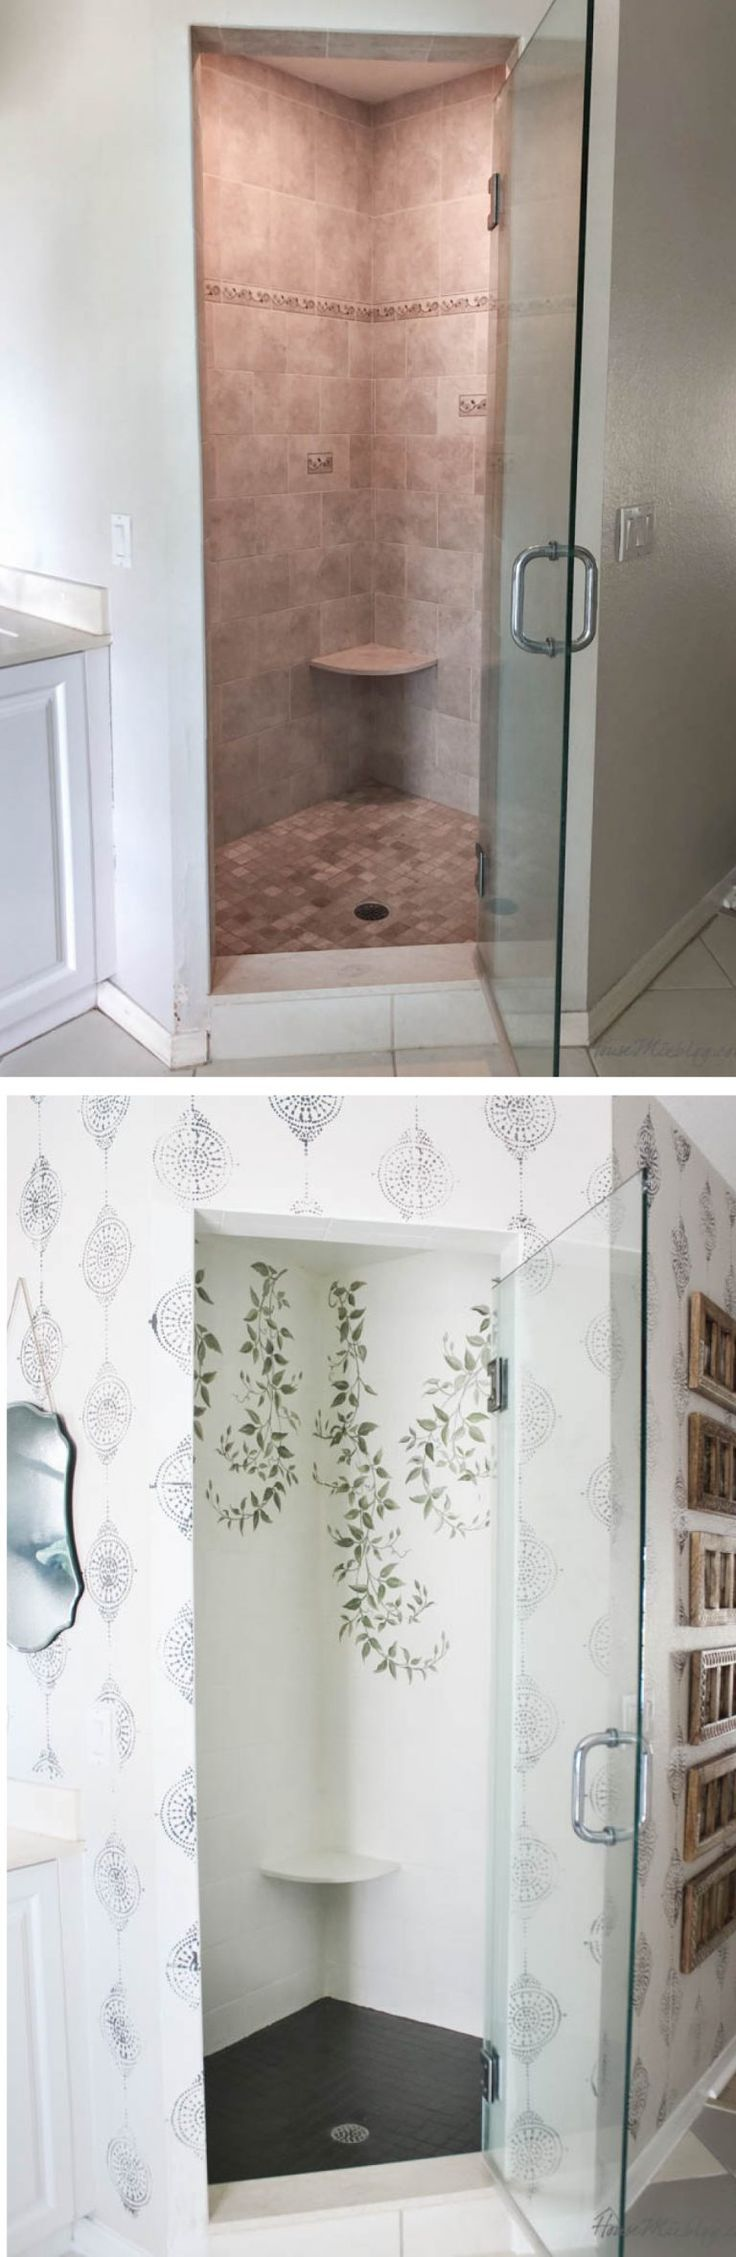 How to paint bathroom tile floor, shower, backsplash